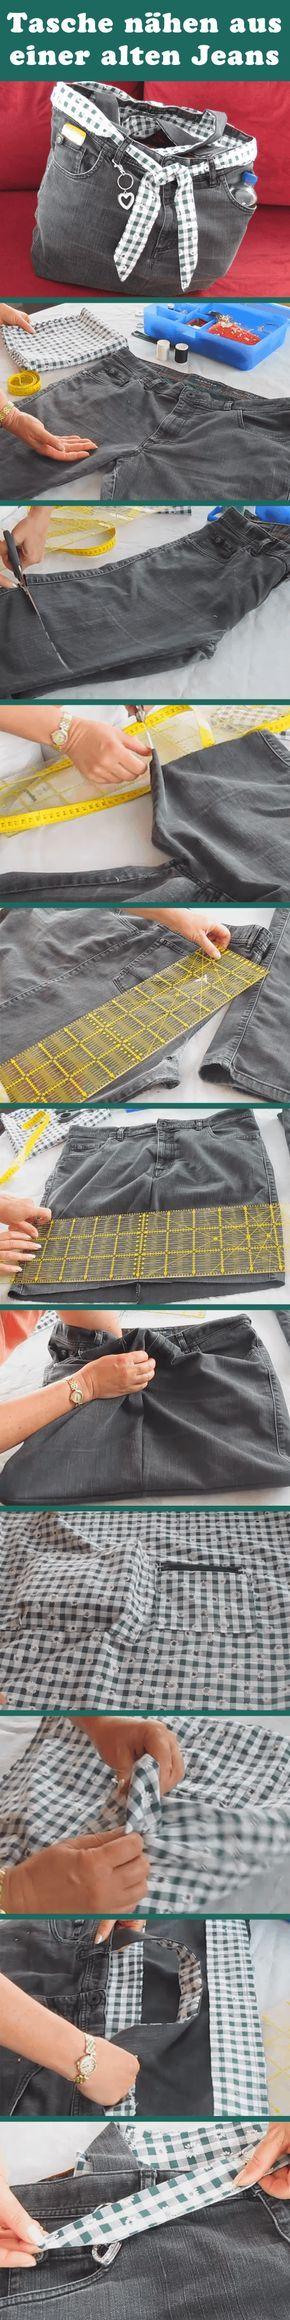 24 best Nähen neu images on Pinterest | Sewing patterns, Sewing ...